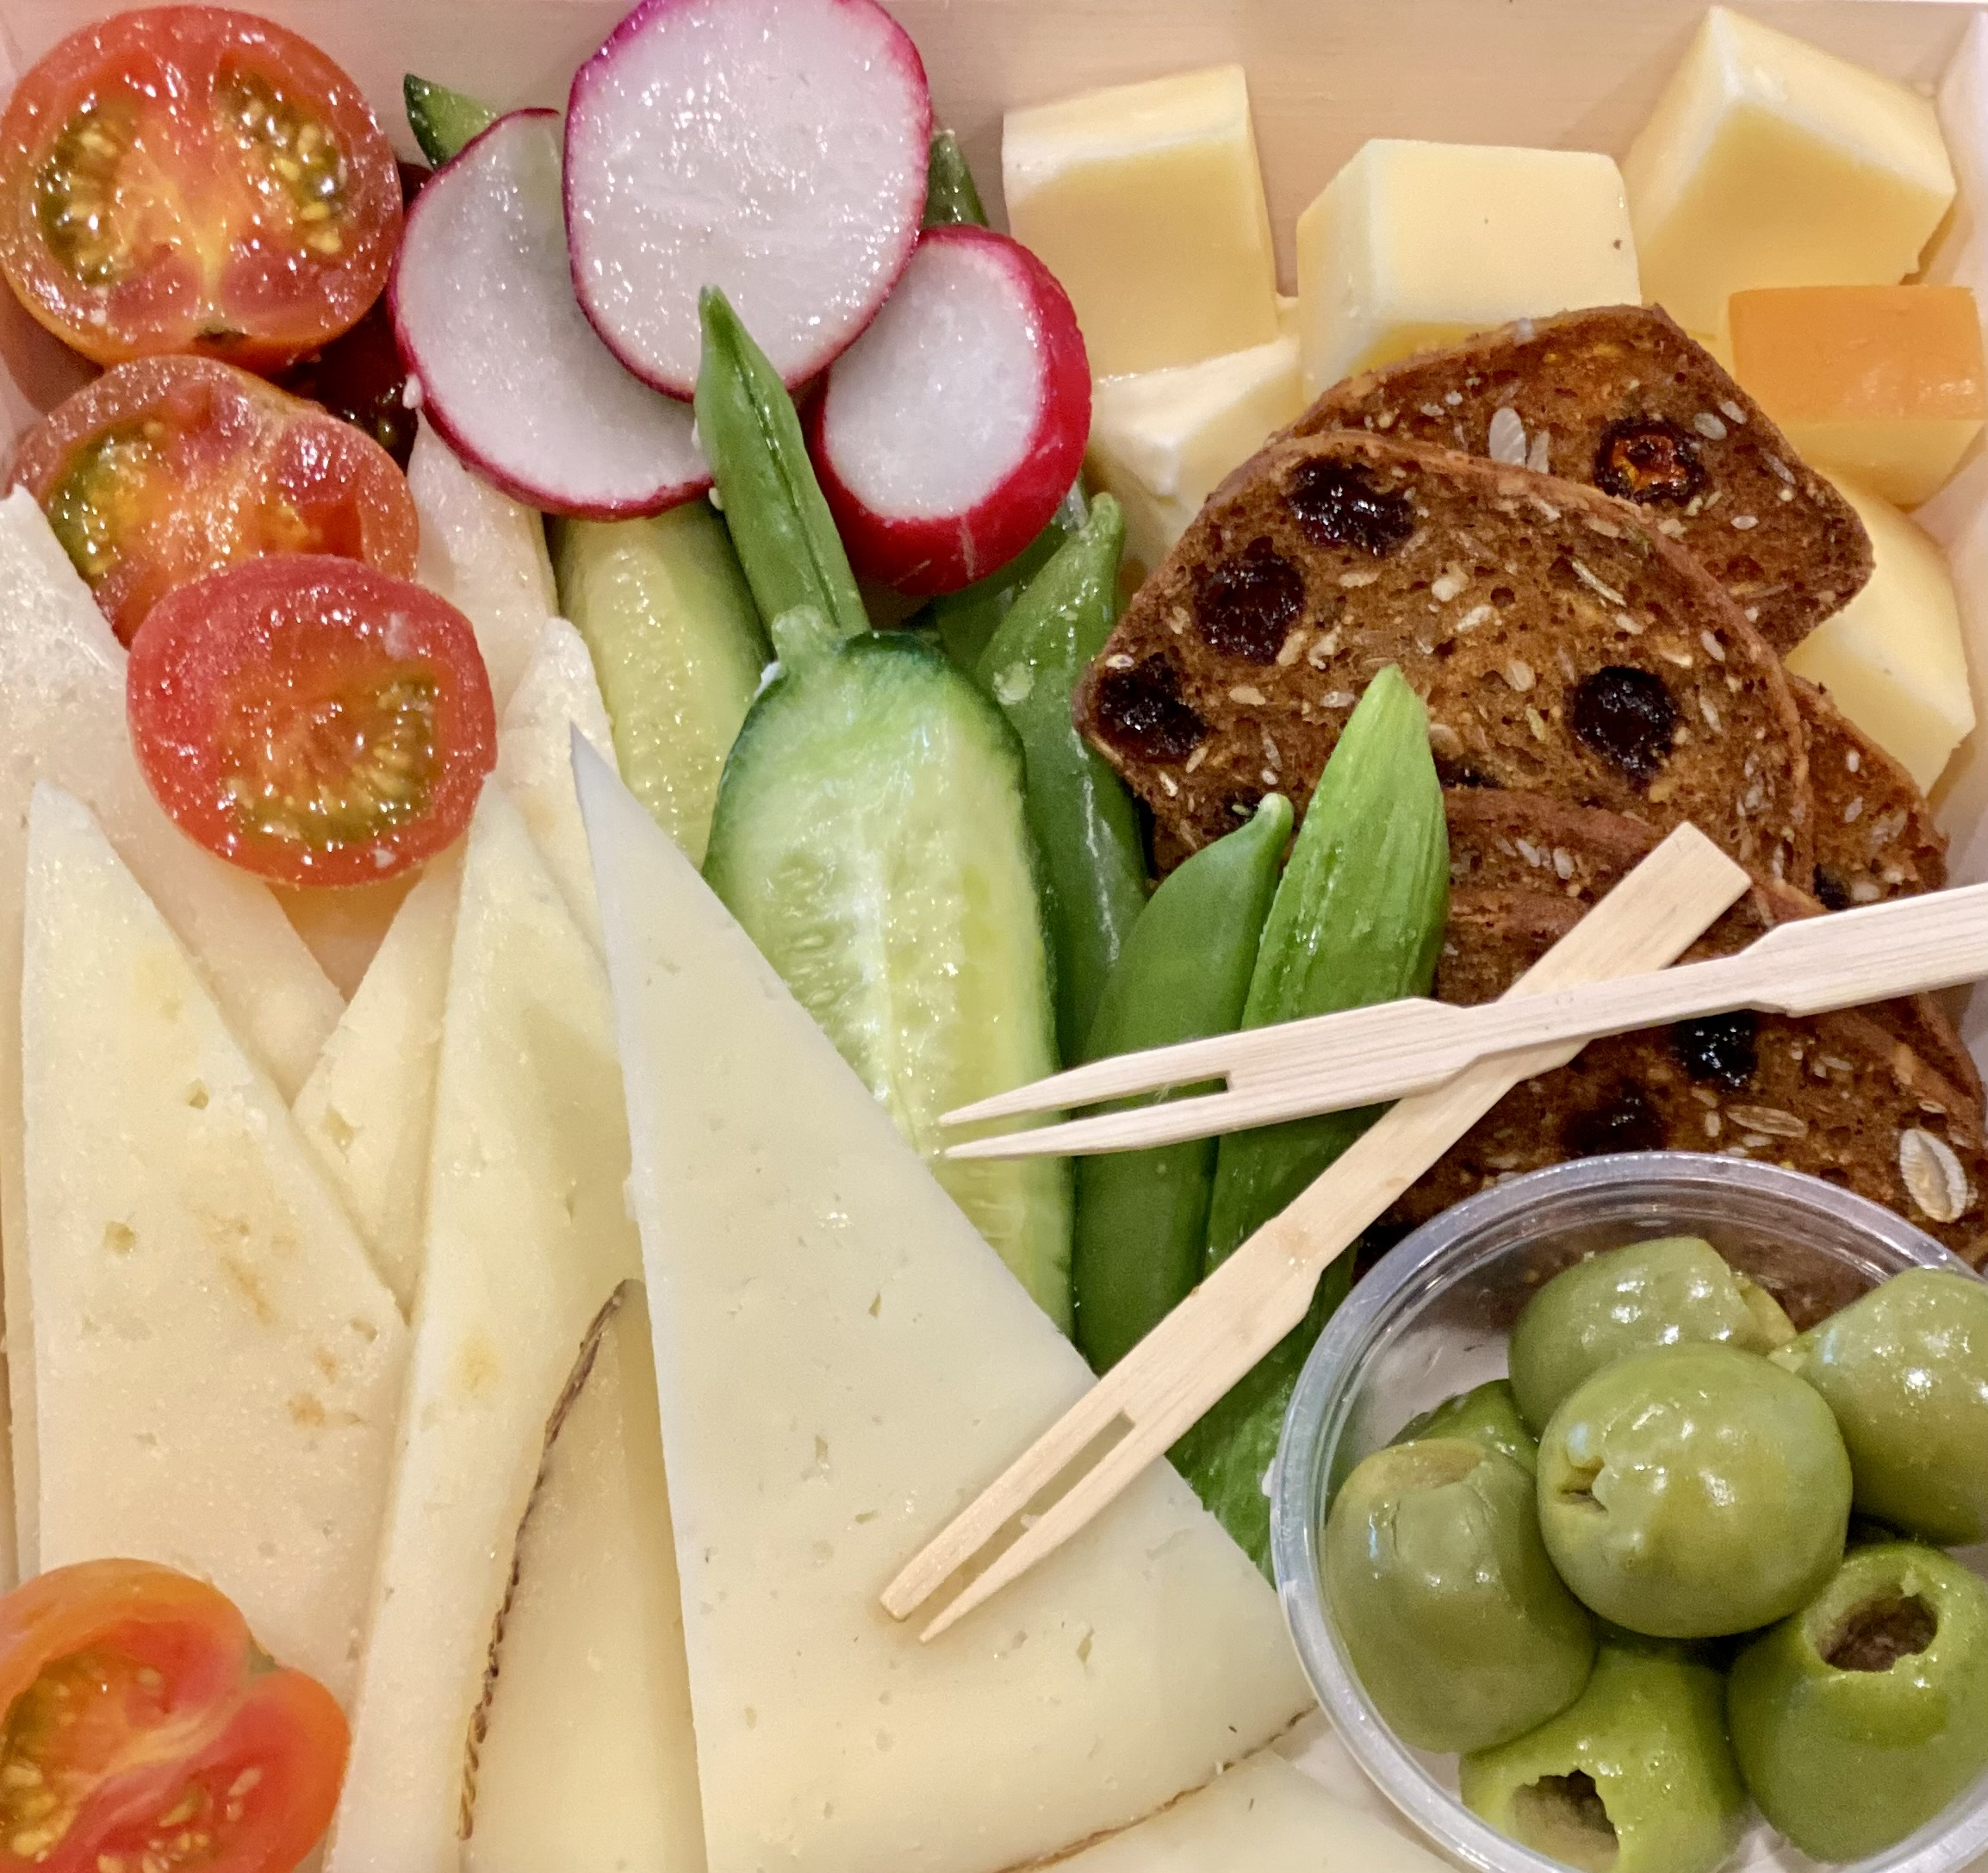 Cheese Please! (& Veggies)